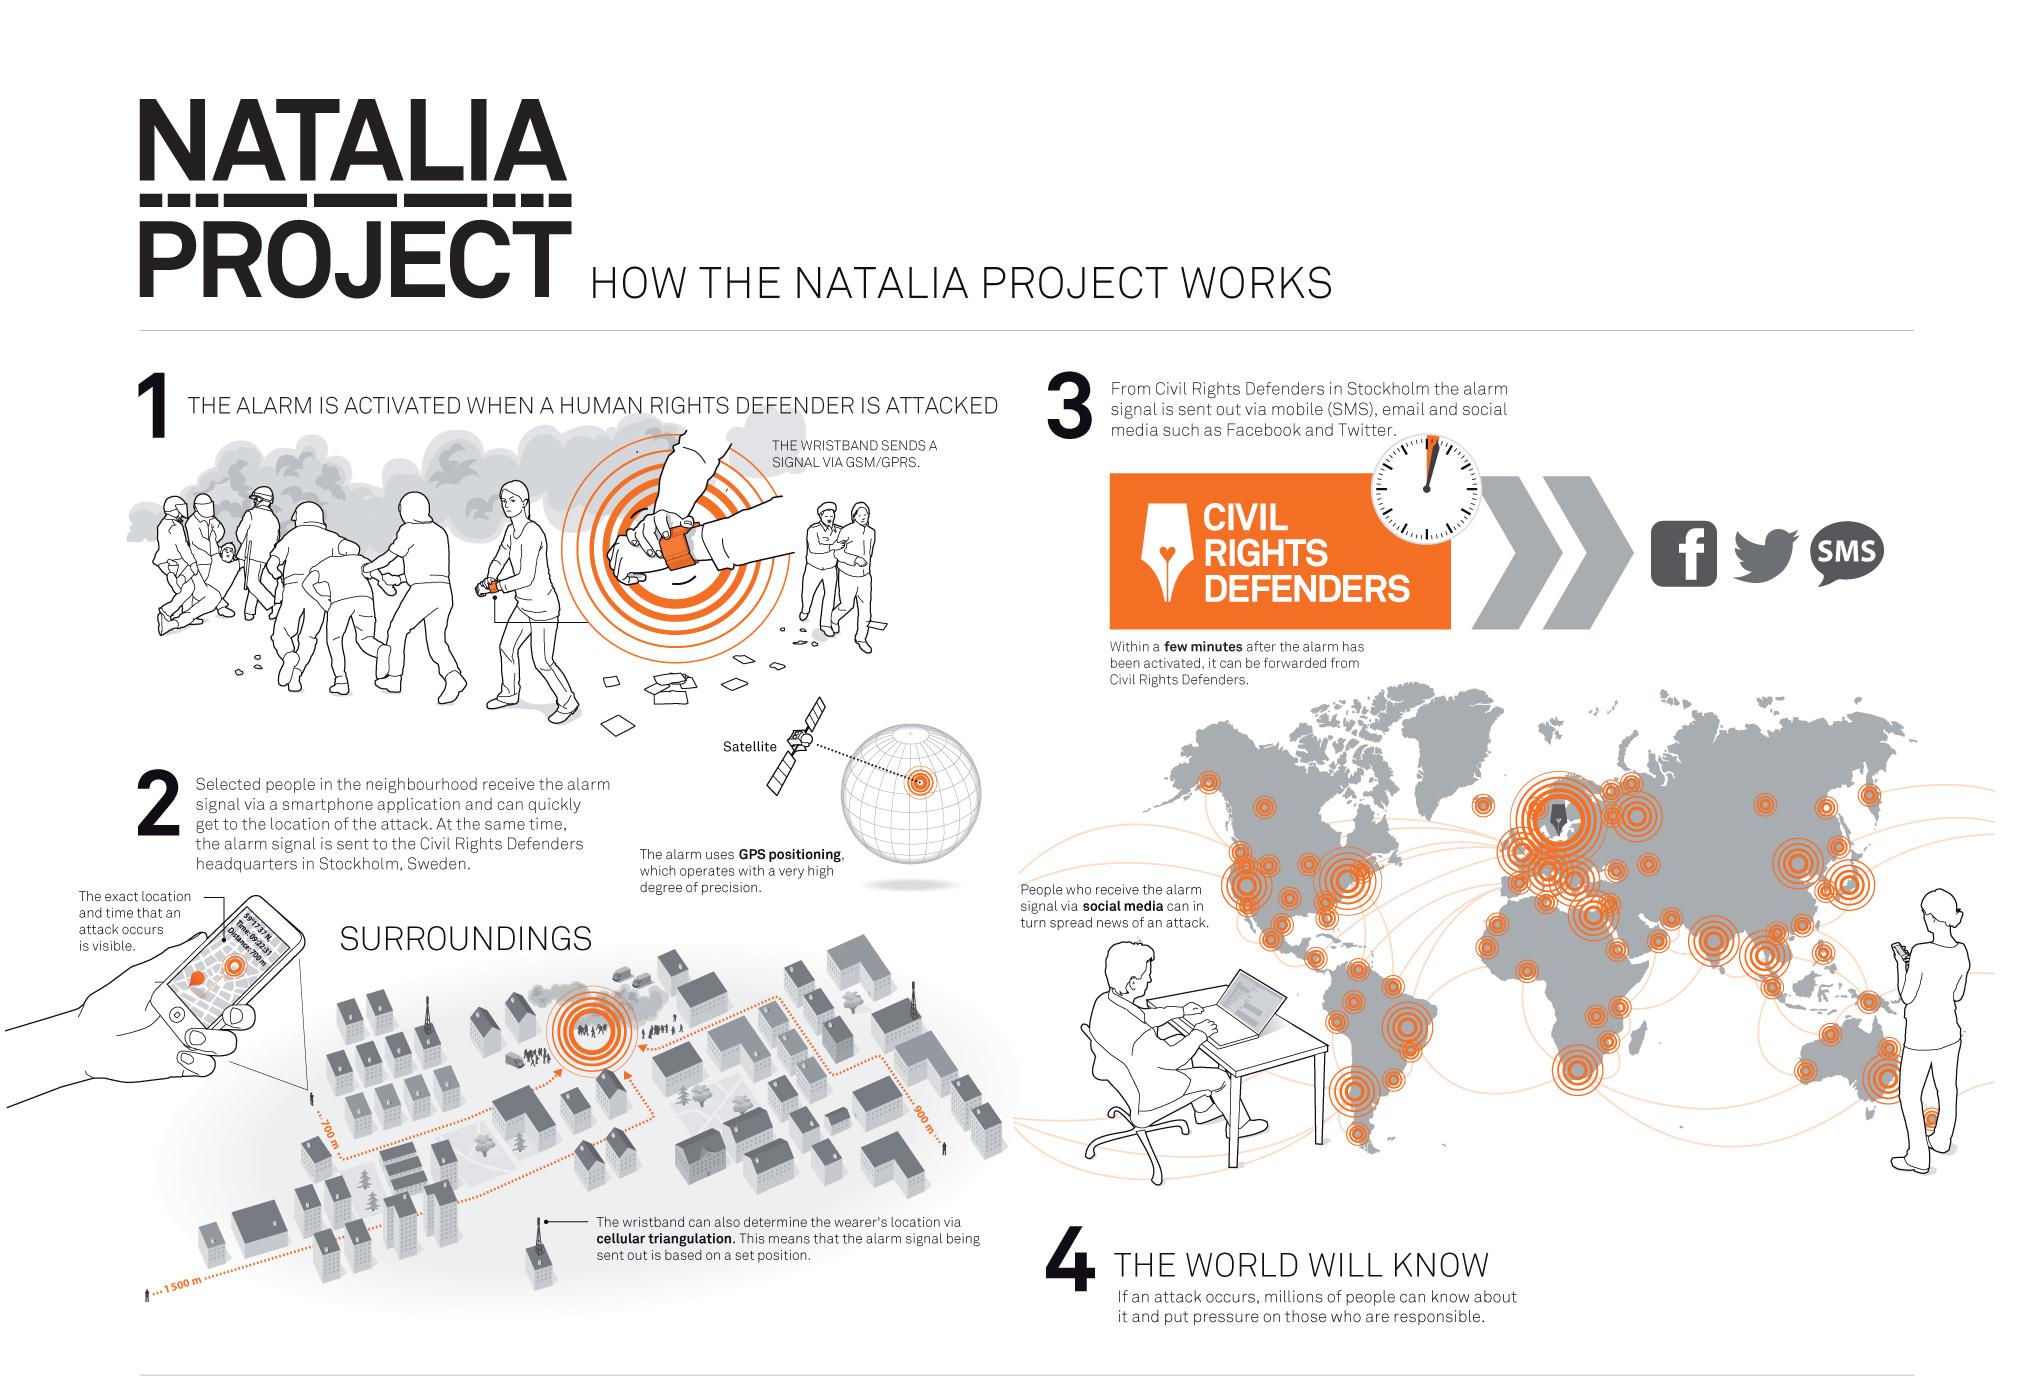 CRD_NATALIA_long_Eng-via-partecipactive_crowdsourced-activism